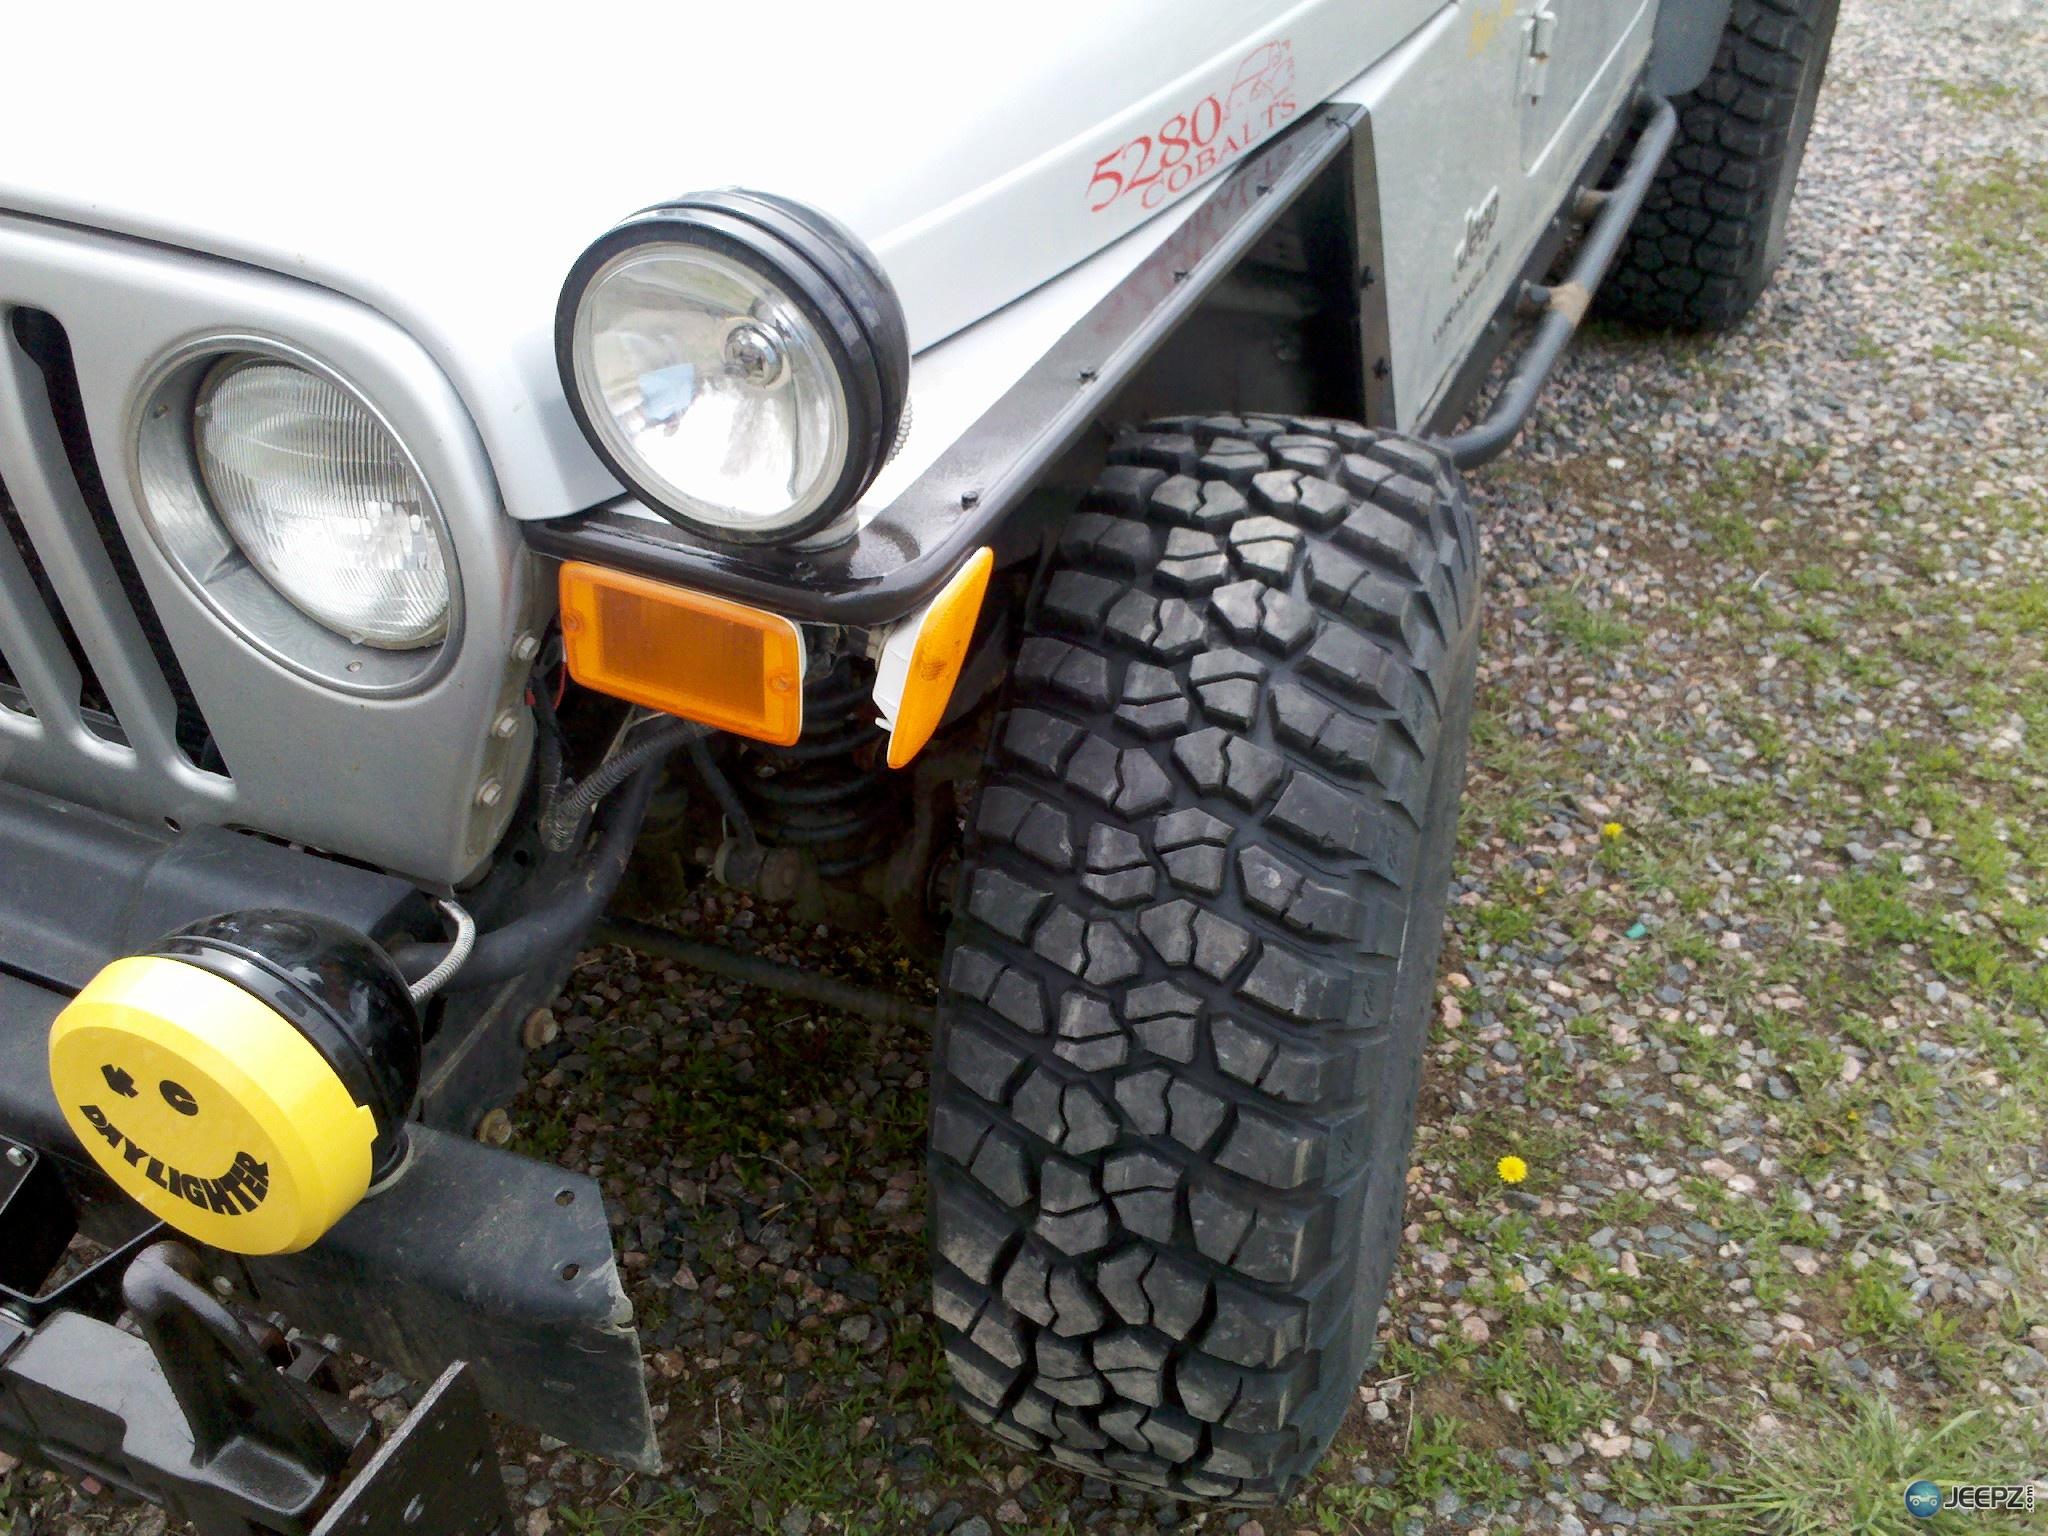 2006 Tj Naked Jeep or Sid